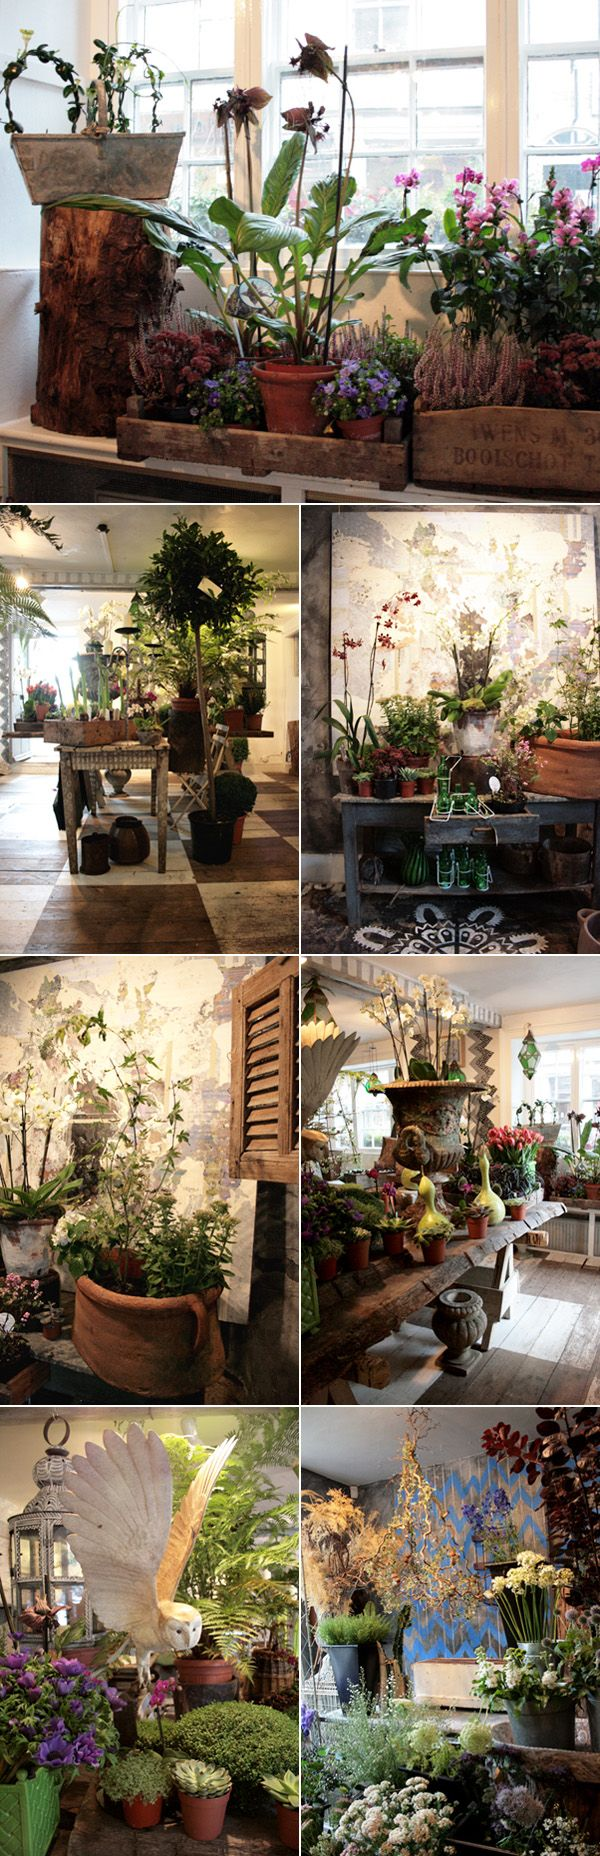 Inspiration for Flora, Adrian's flower shop.